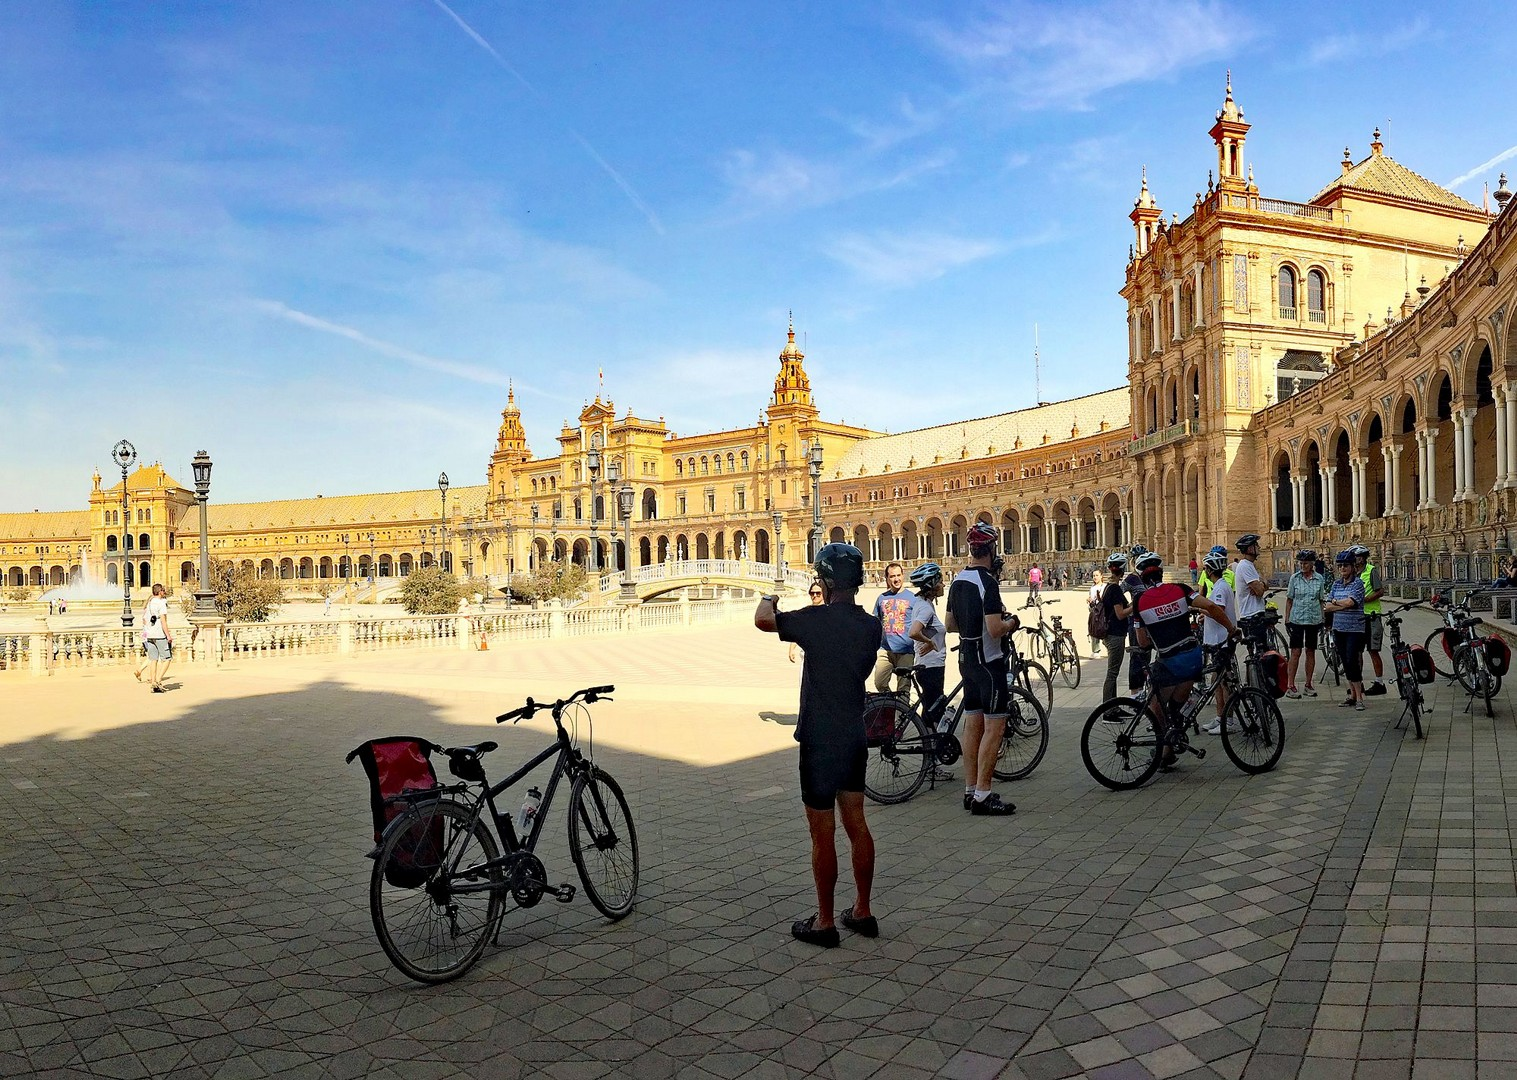 plaza-de-espana-seville-cycling-holiday-in-spain-granada-seville.jpg - Southern Spain - Granada to Seville - Guided Leisure Cycling Holiday - Leisure Cycling